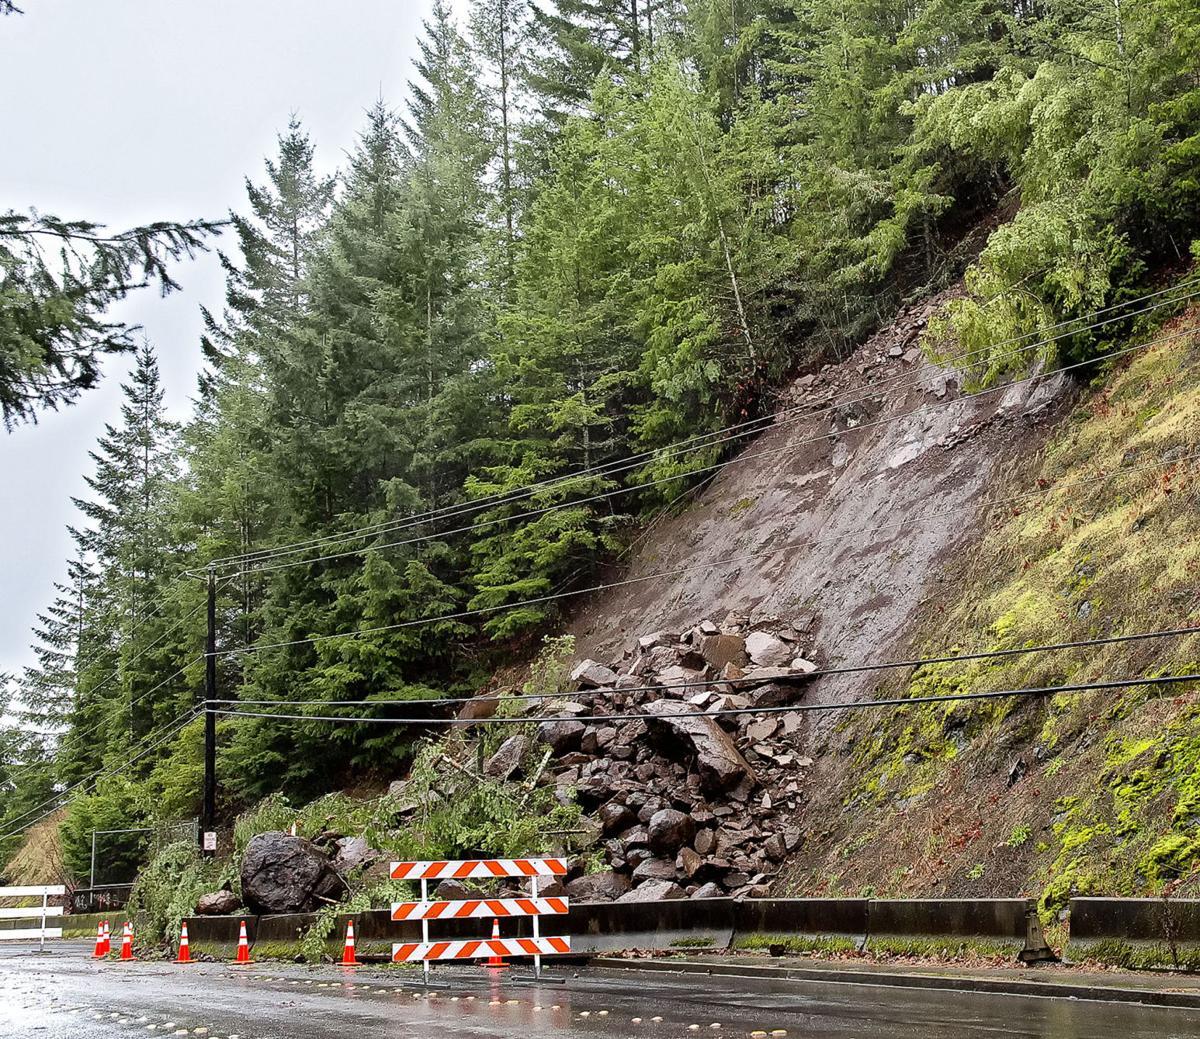 38th Street rockslide